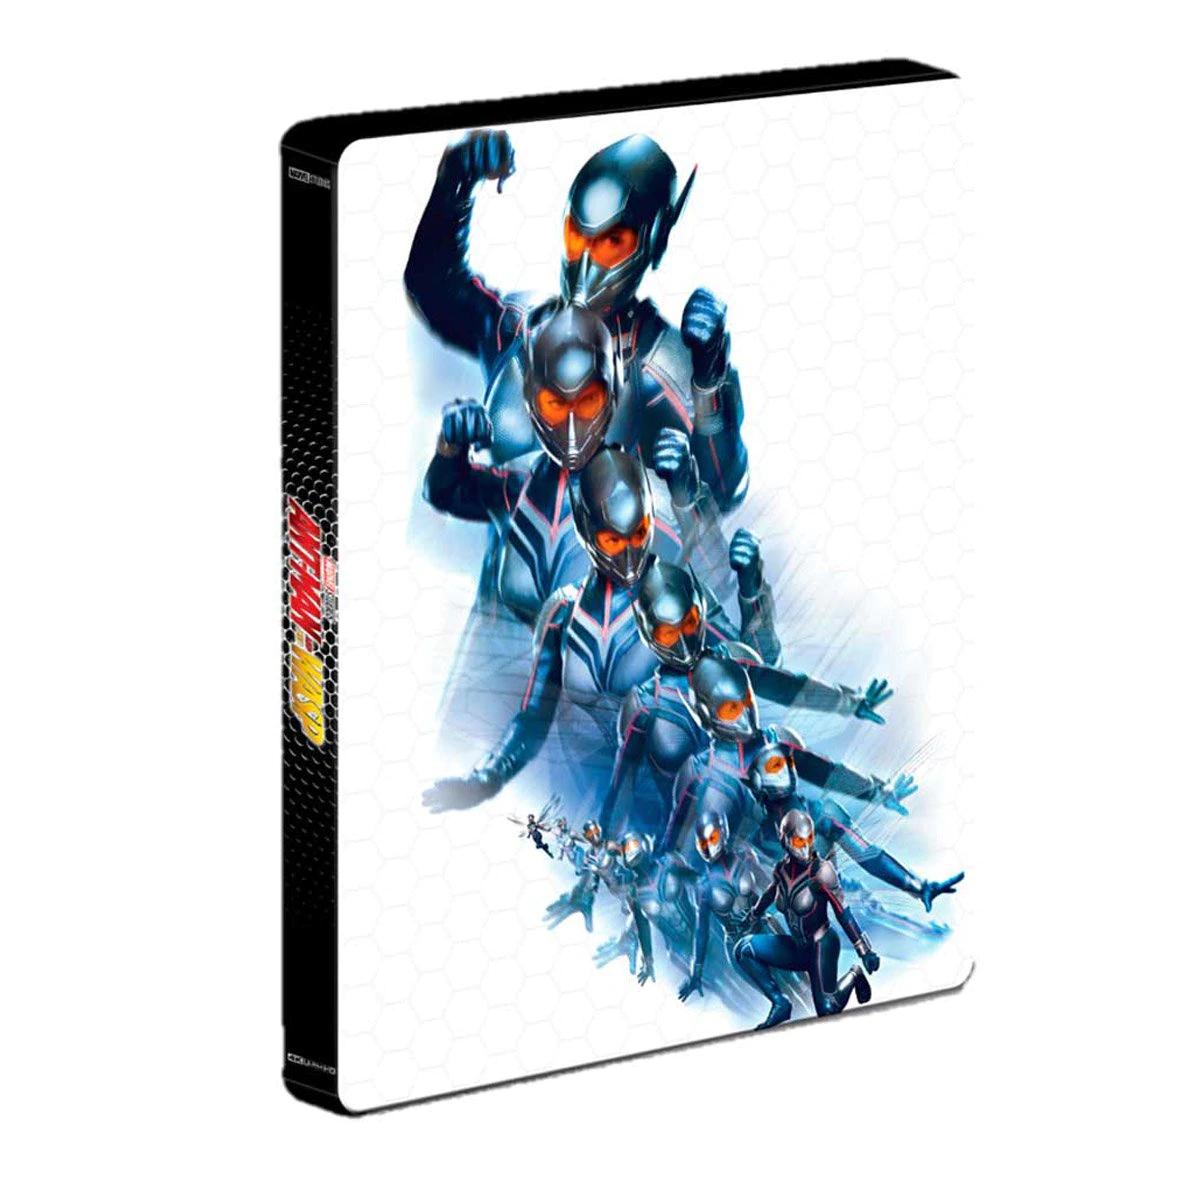 Sears en línea: Bluray Steelbook Ant-Man and the Wasp y Thor Ragnarok